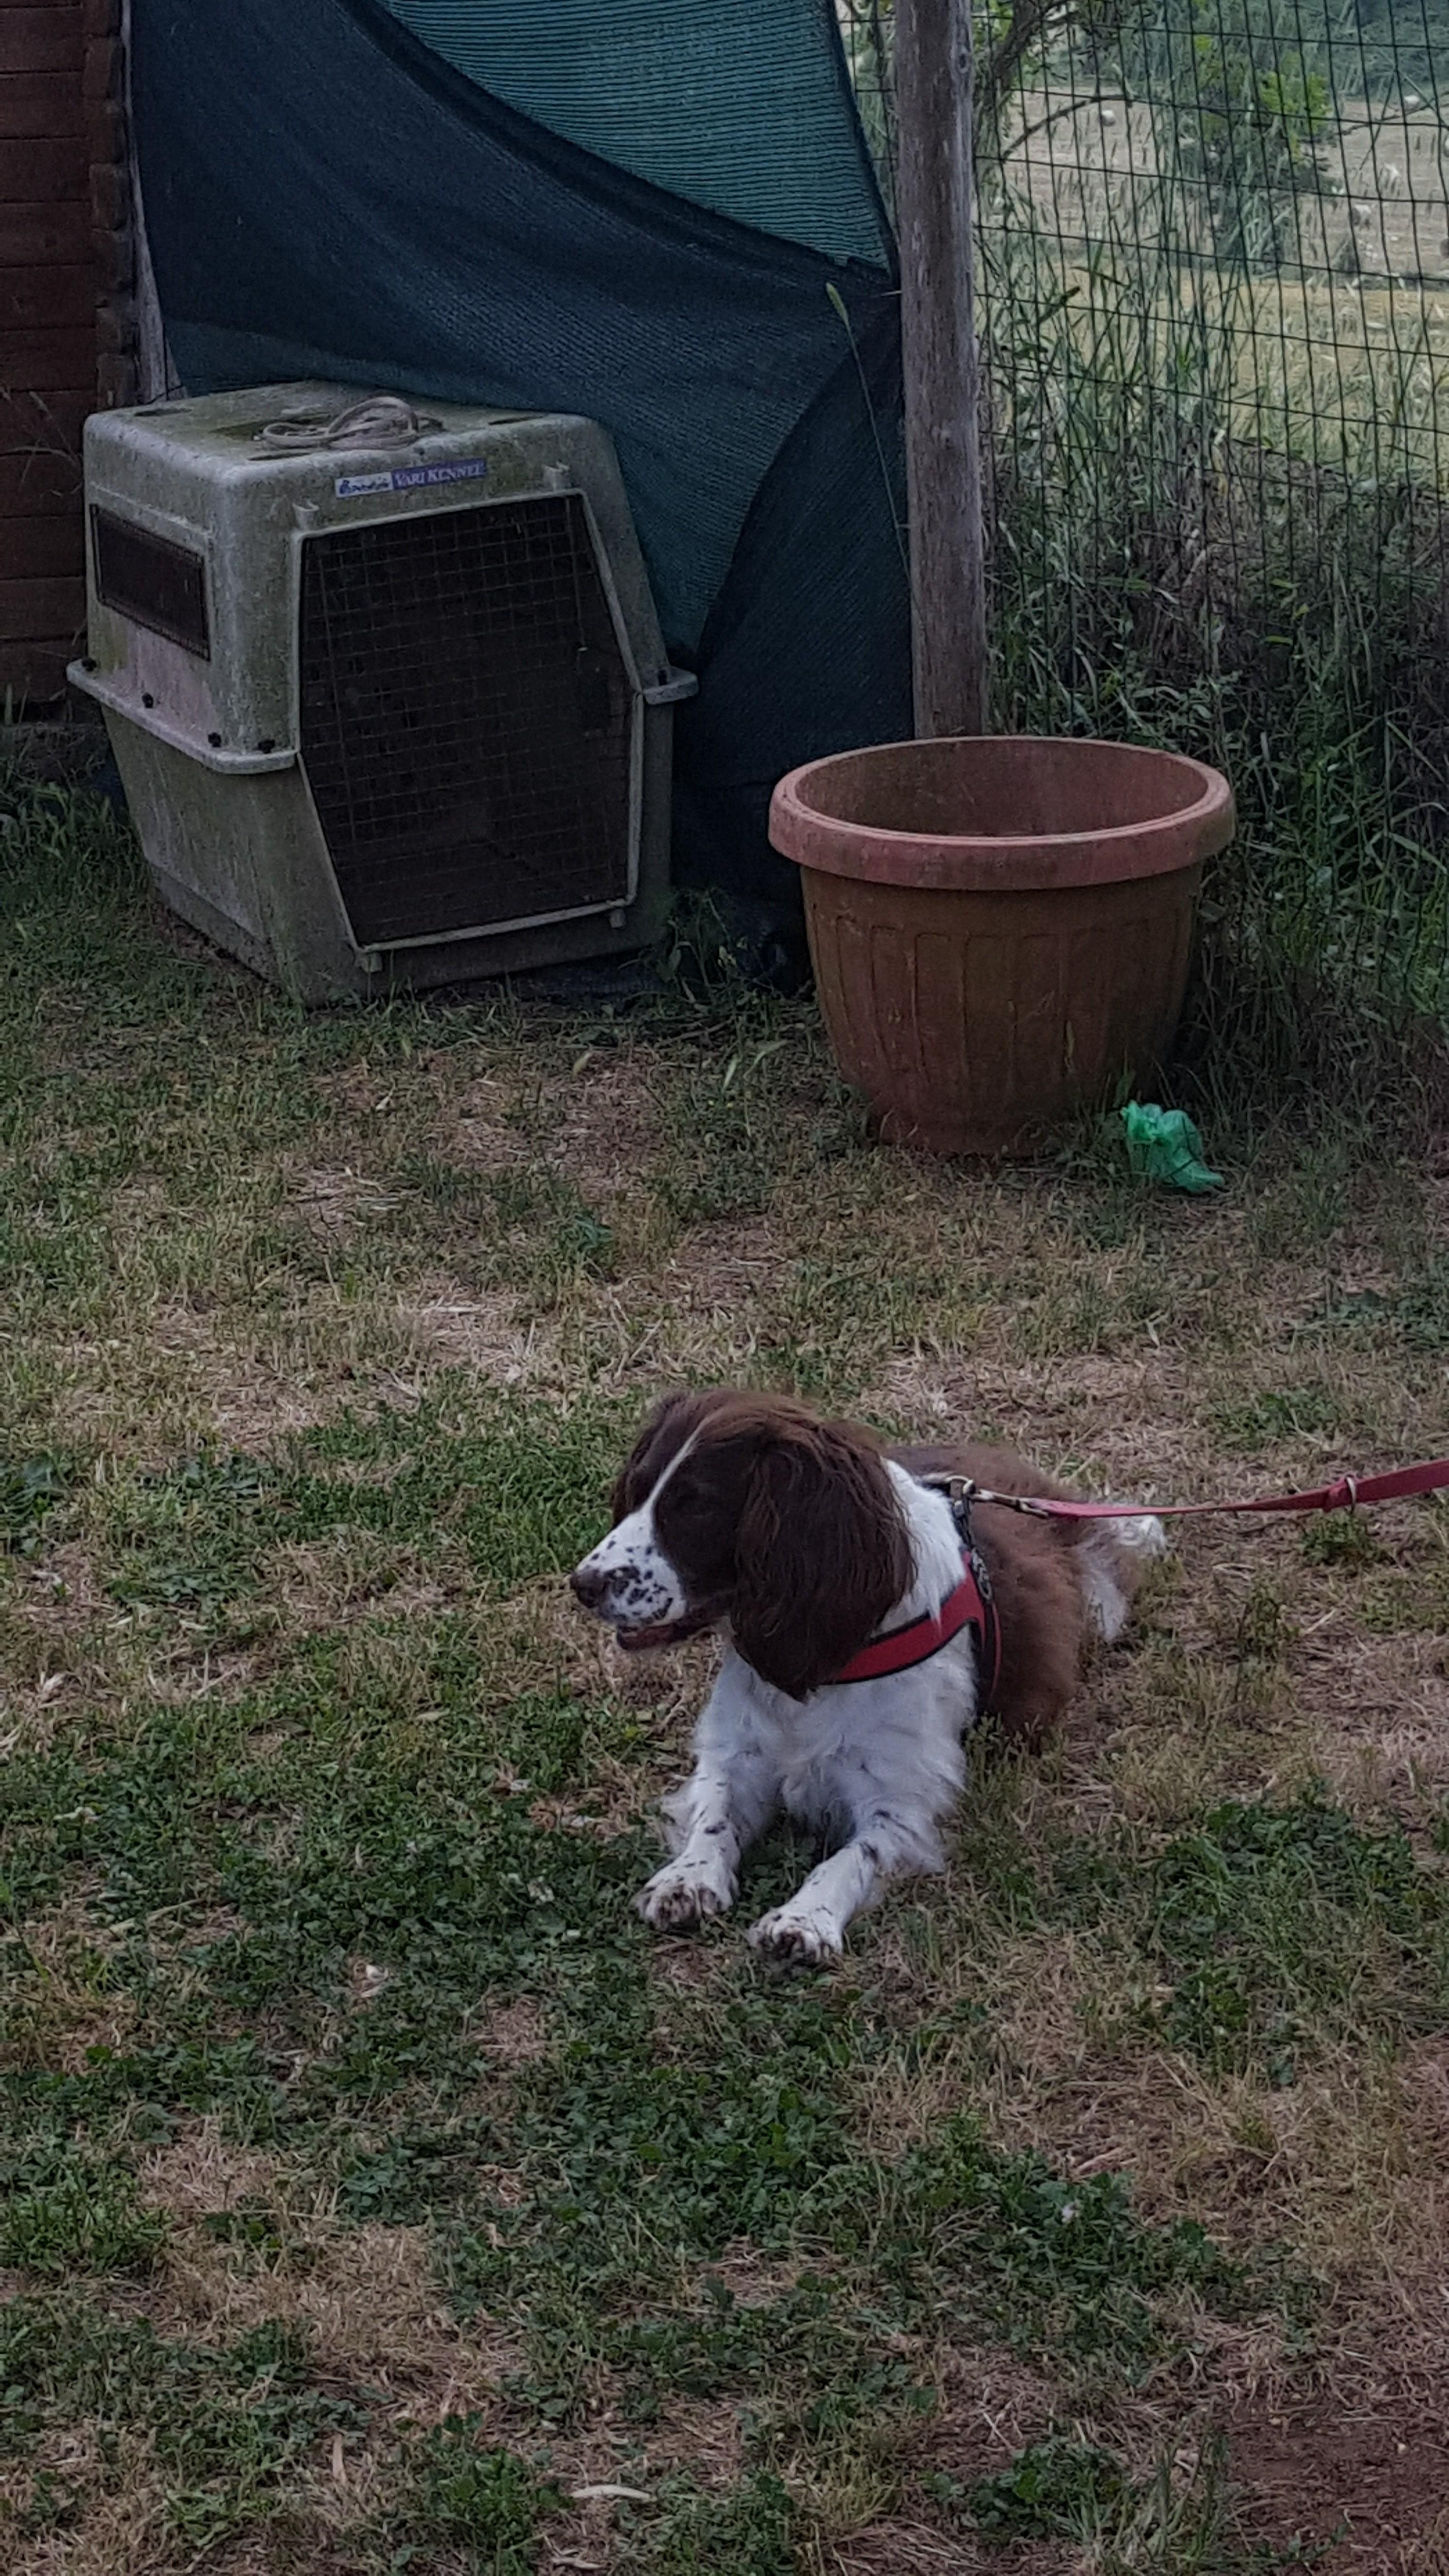 Nanà e l'asilo per cani Barking Dogs Roma Sud